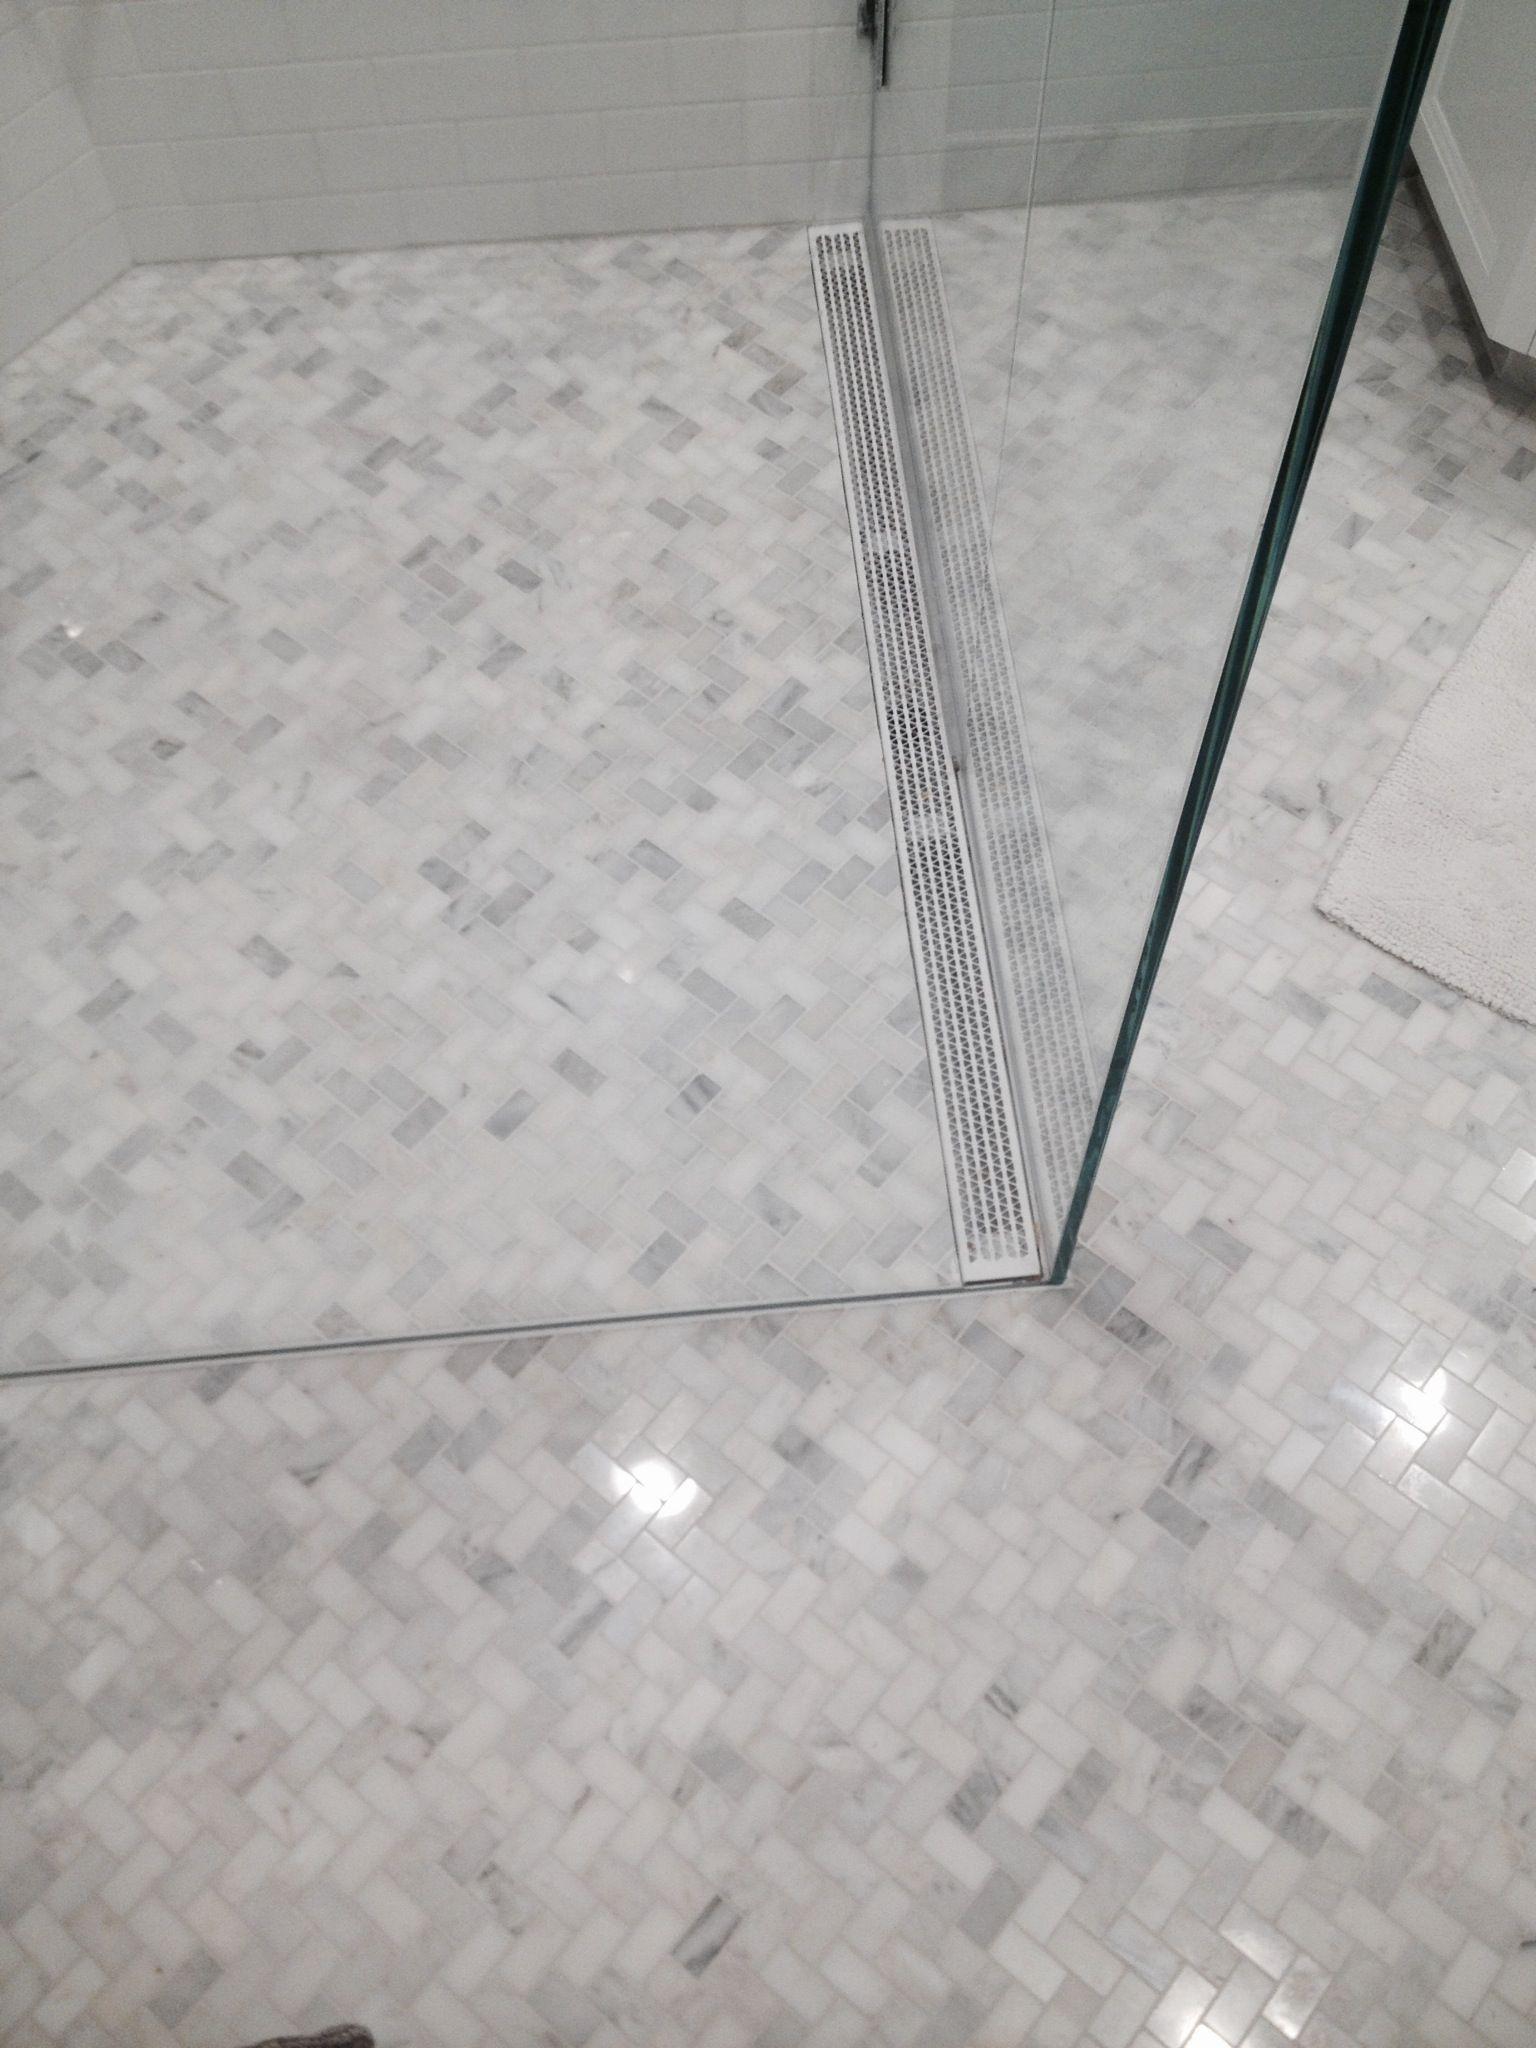 to drain infinity design cool shower bisita back drains schluter guam linear